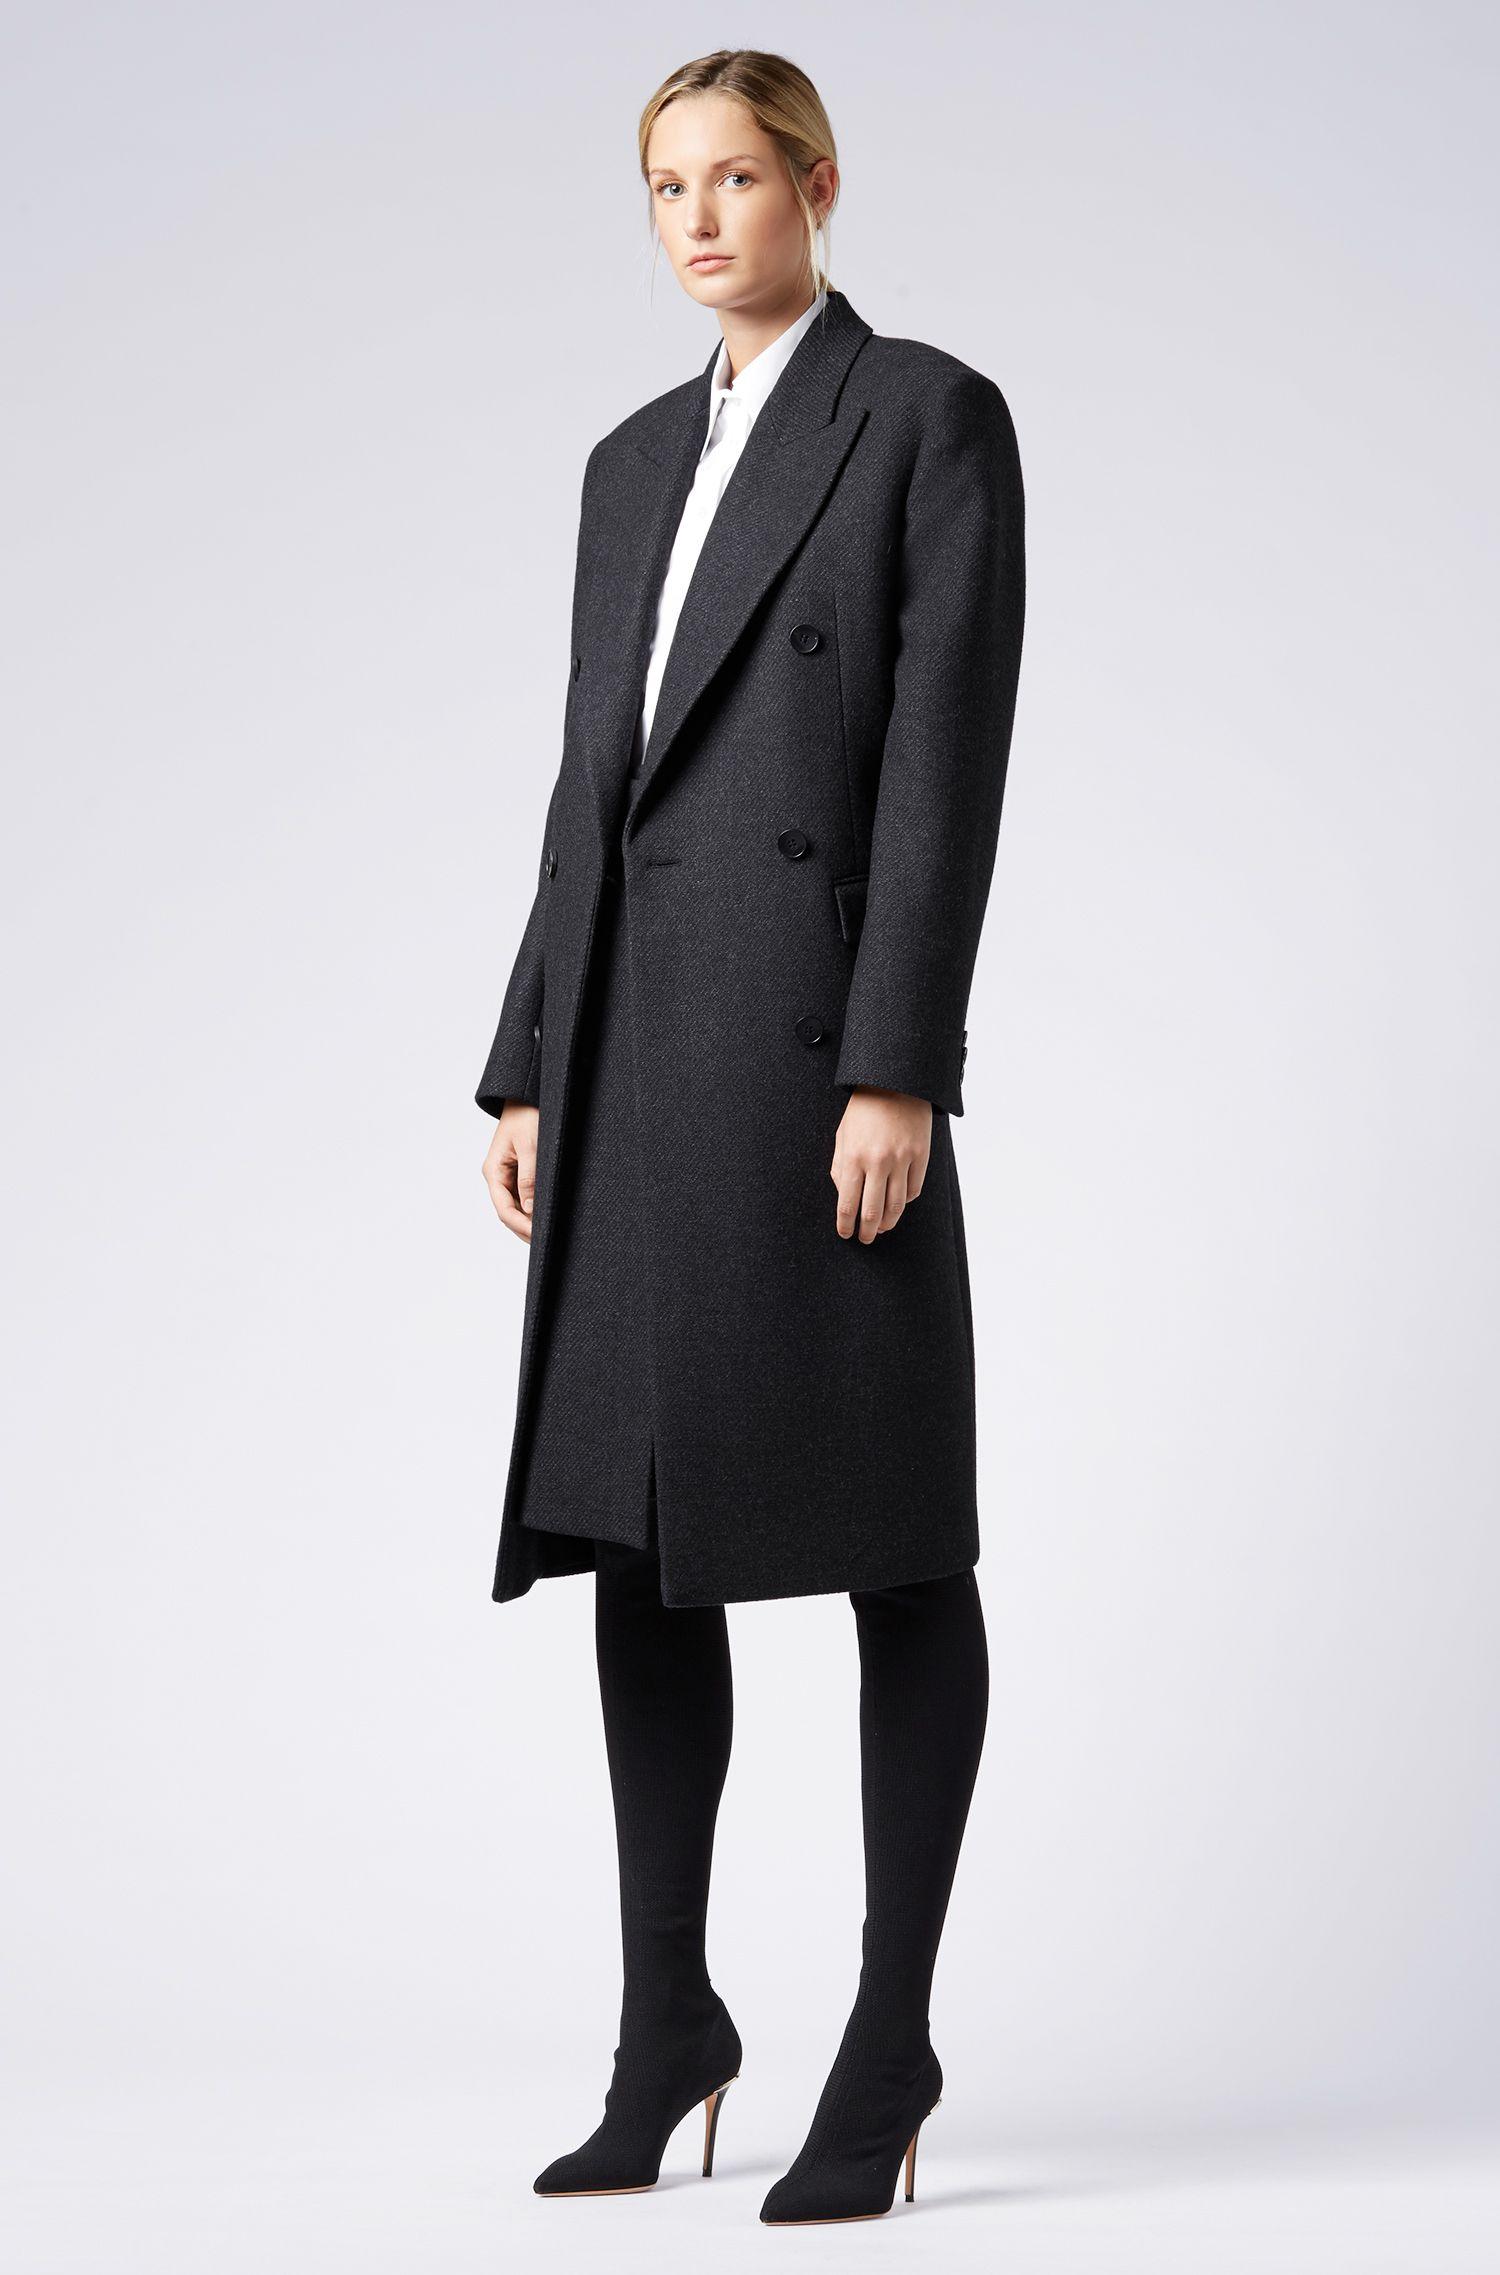 Double-breasted coat in an Italian wool blend